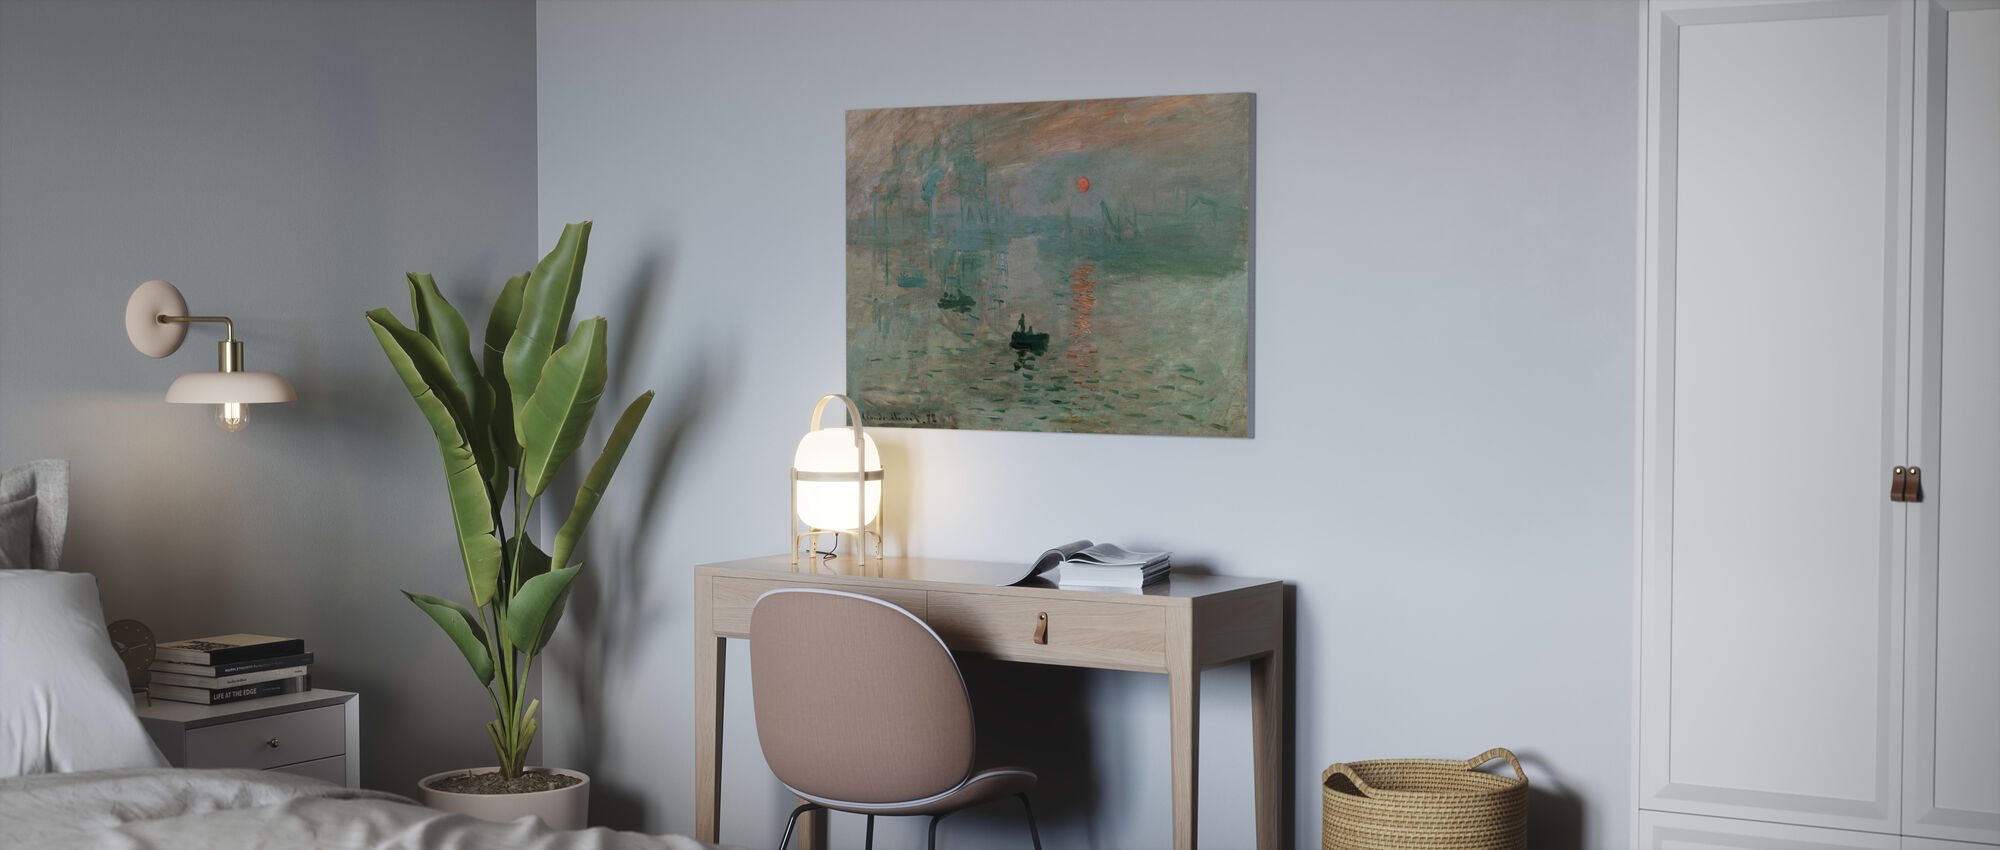 Monet, Claud - Impression - Canvas print - Office